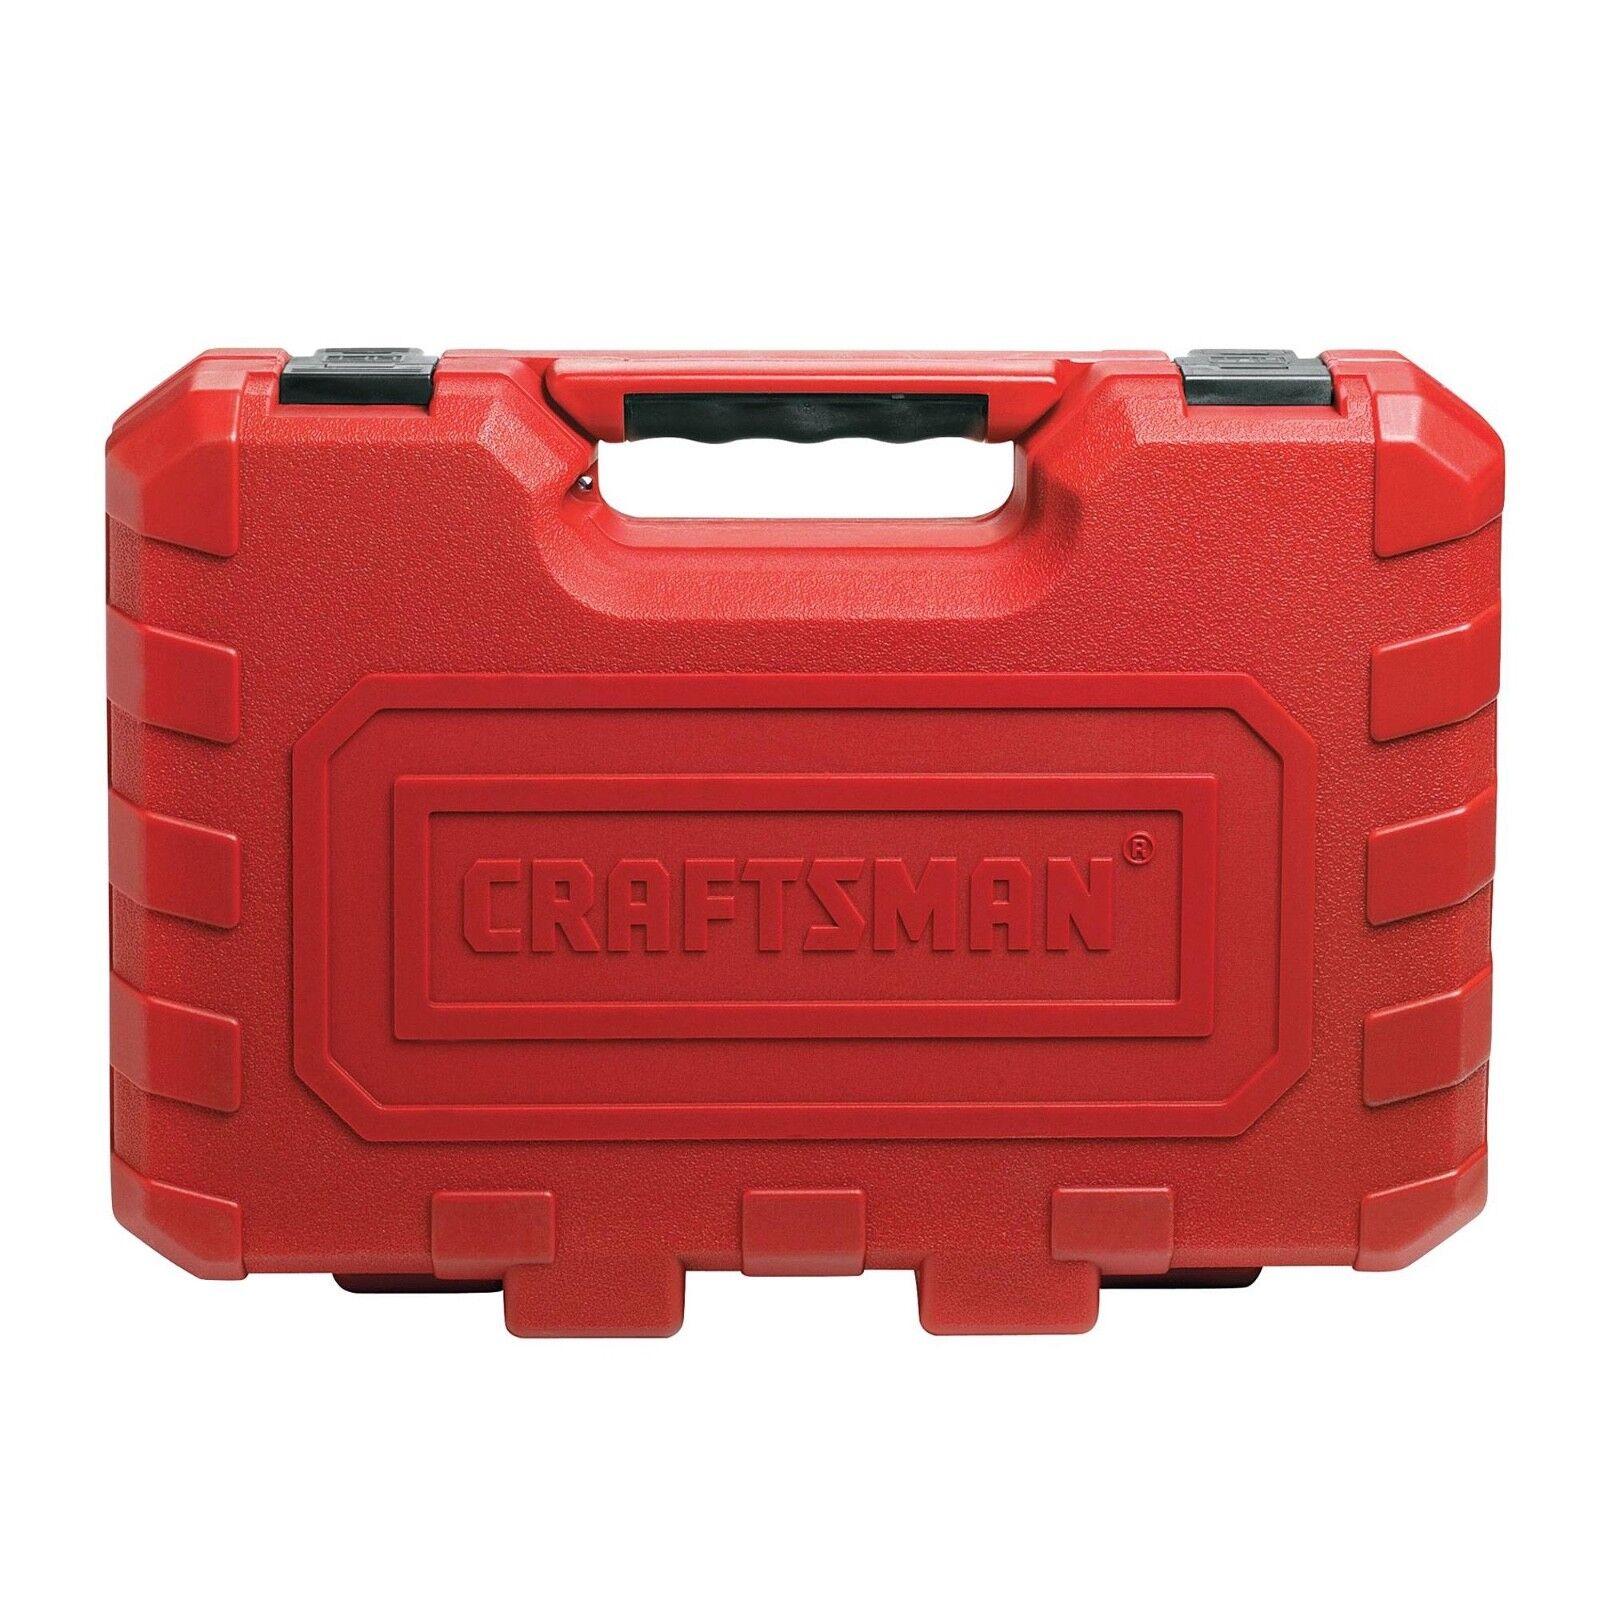 Craftsman 56pc. Universal Mechanic's Tool Set